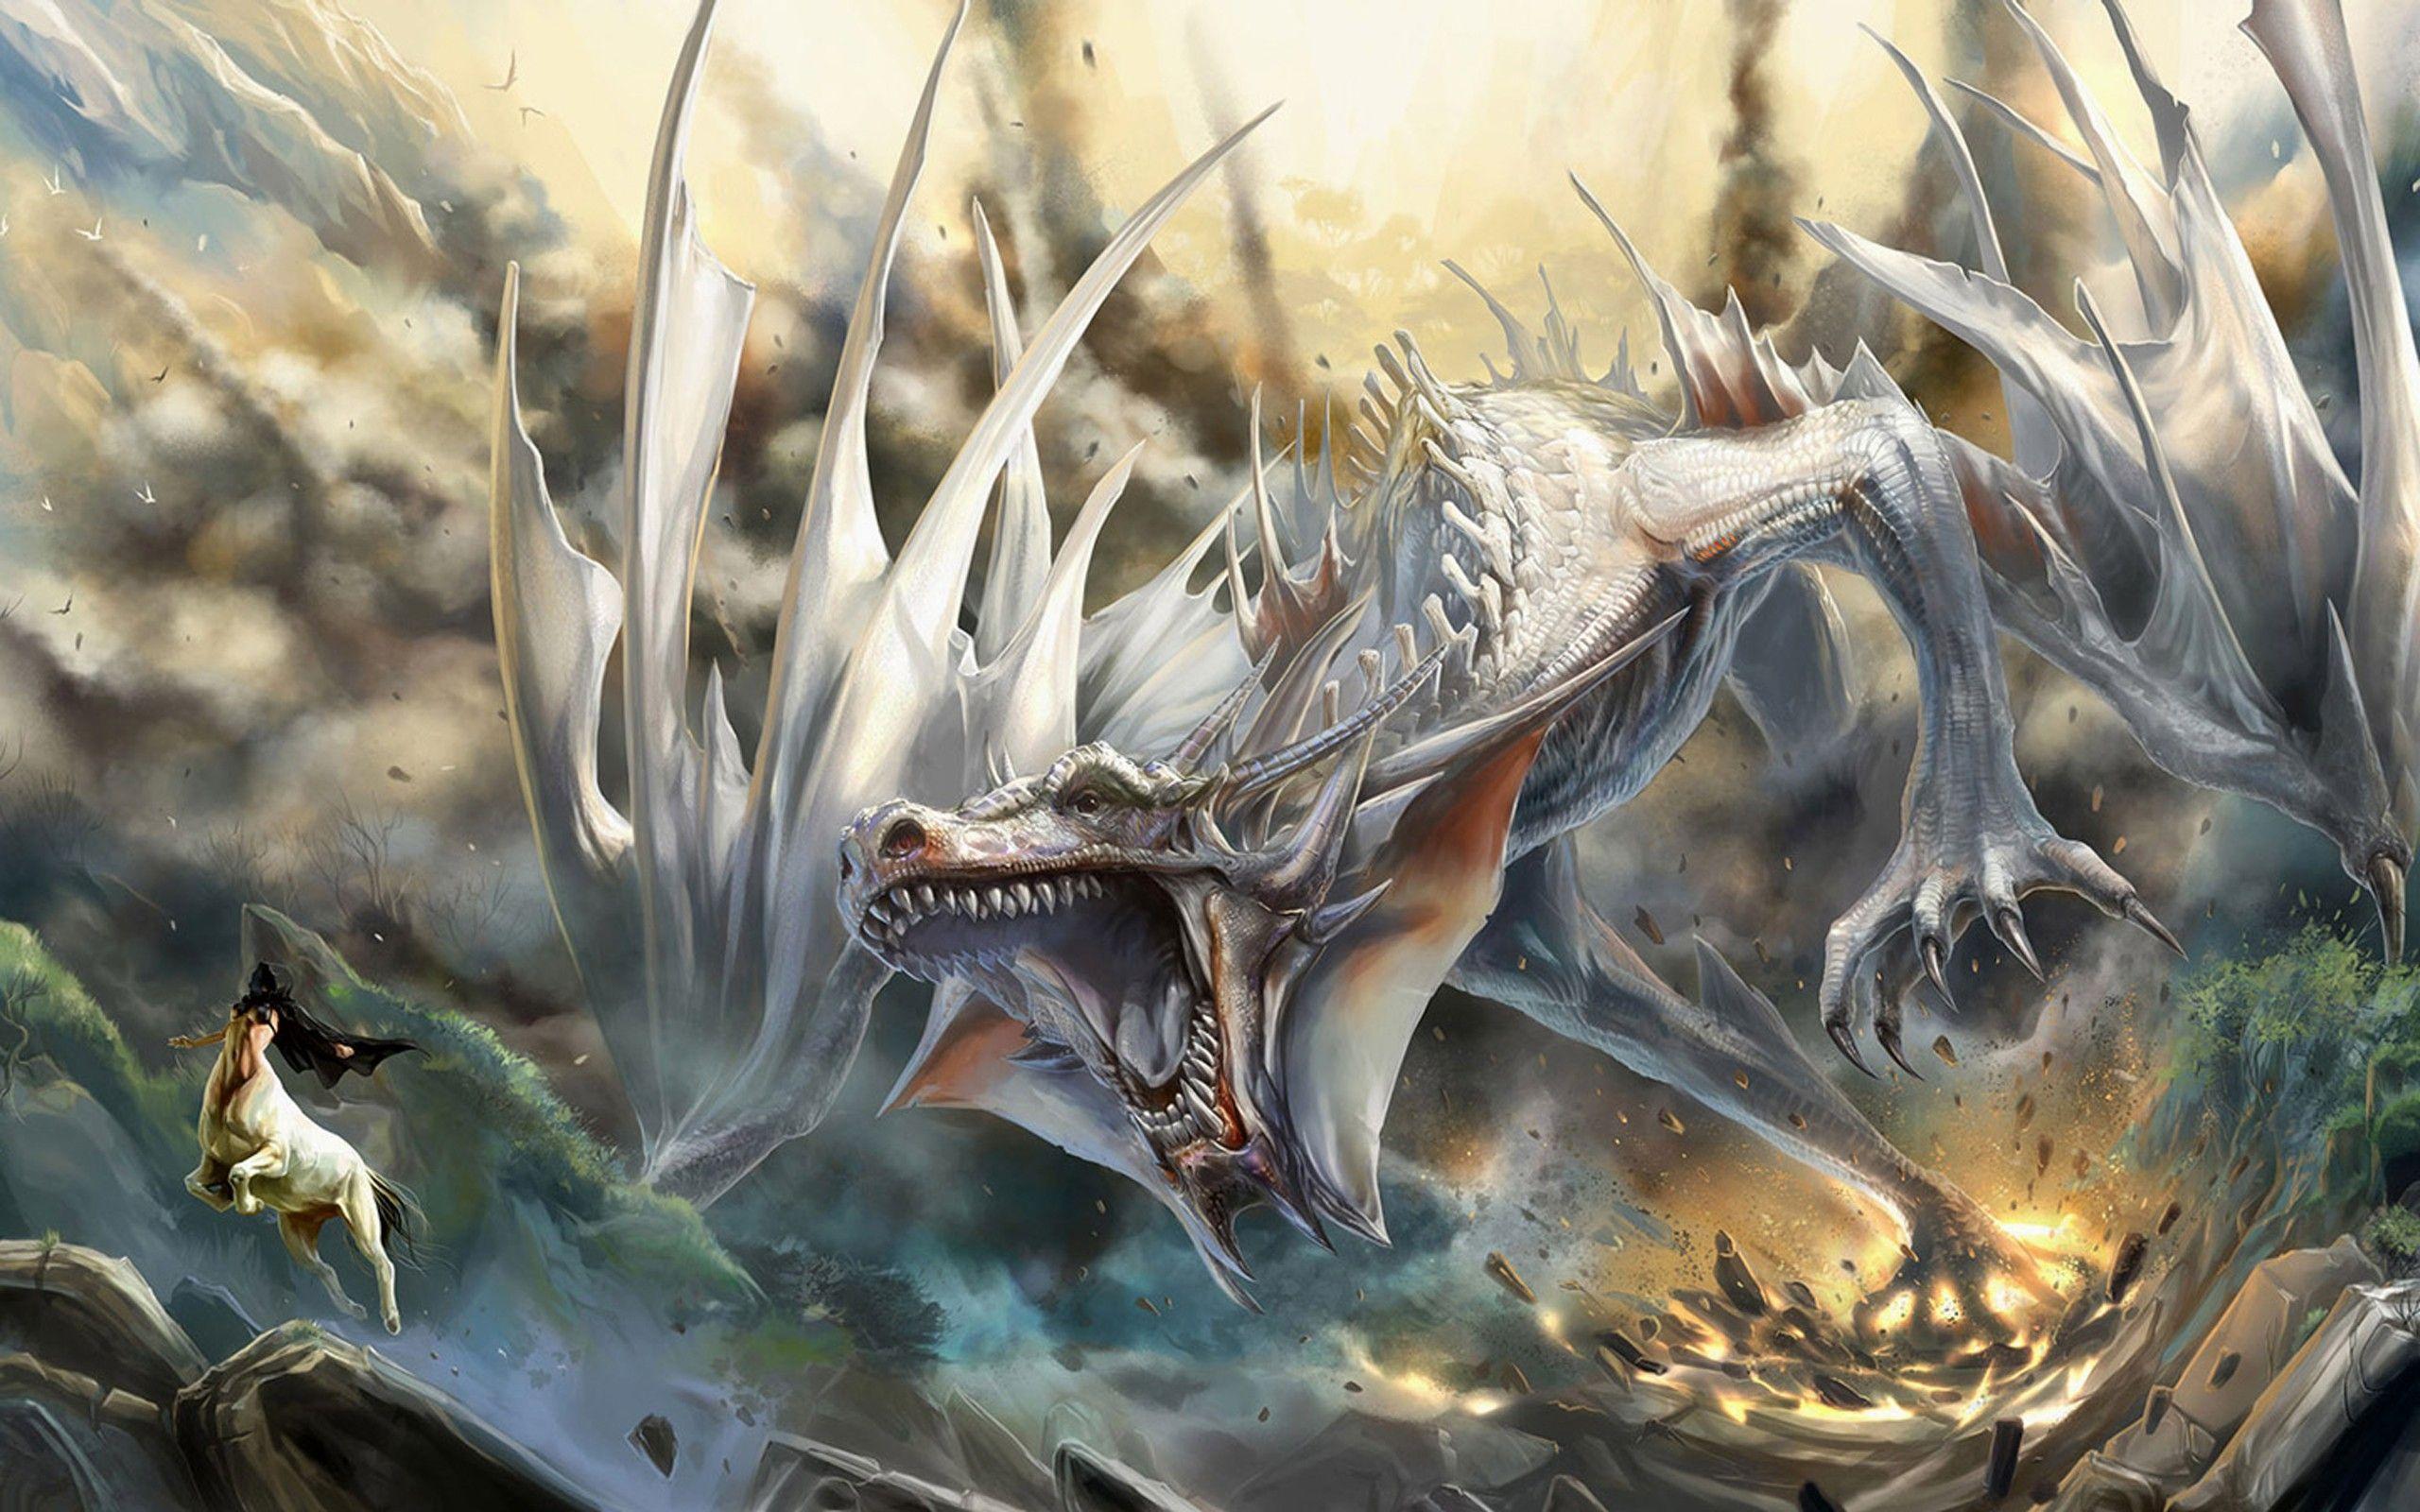 78+] 3d Dragon Wallpaper on WallpaperSafari